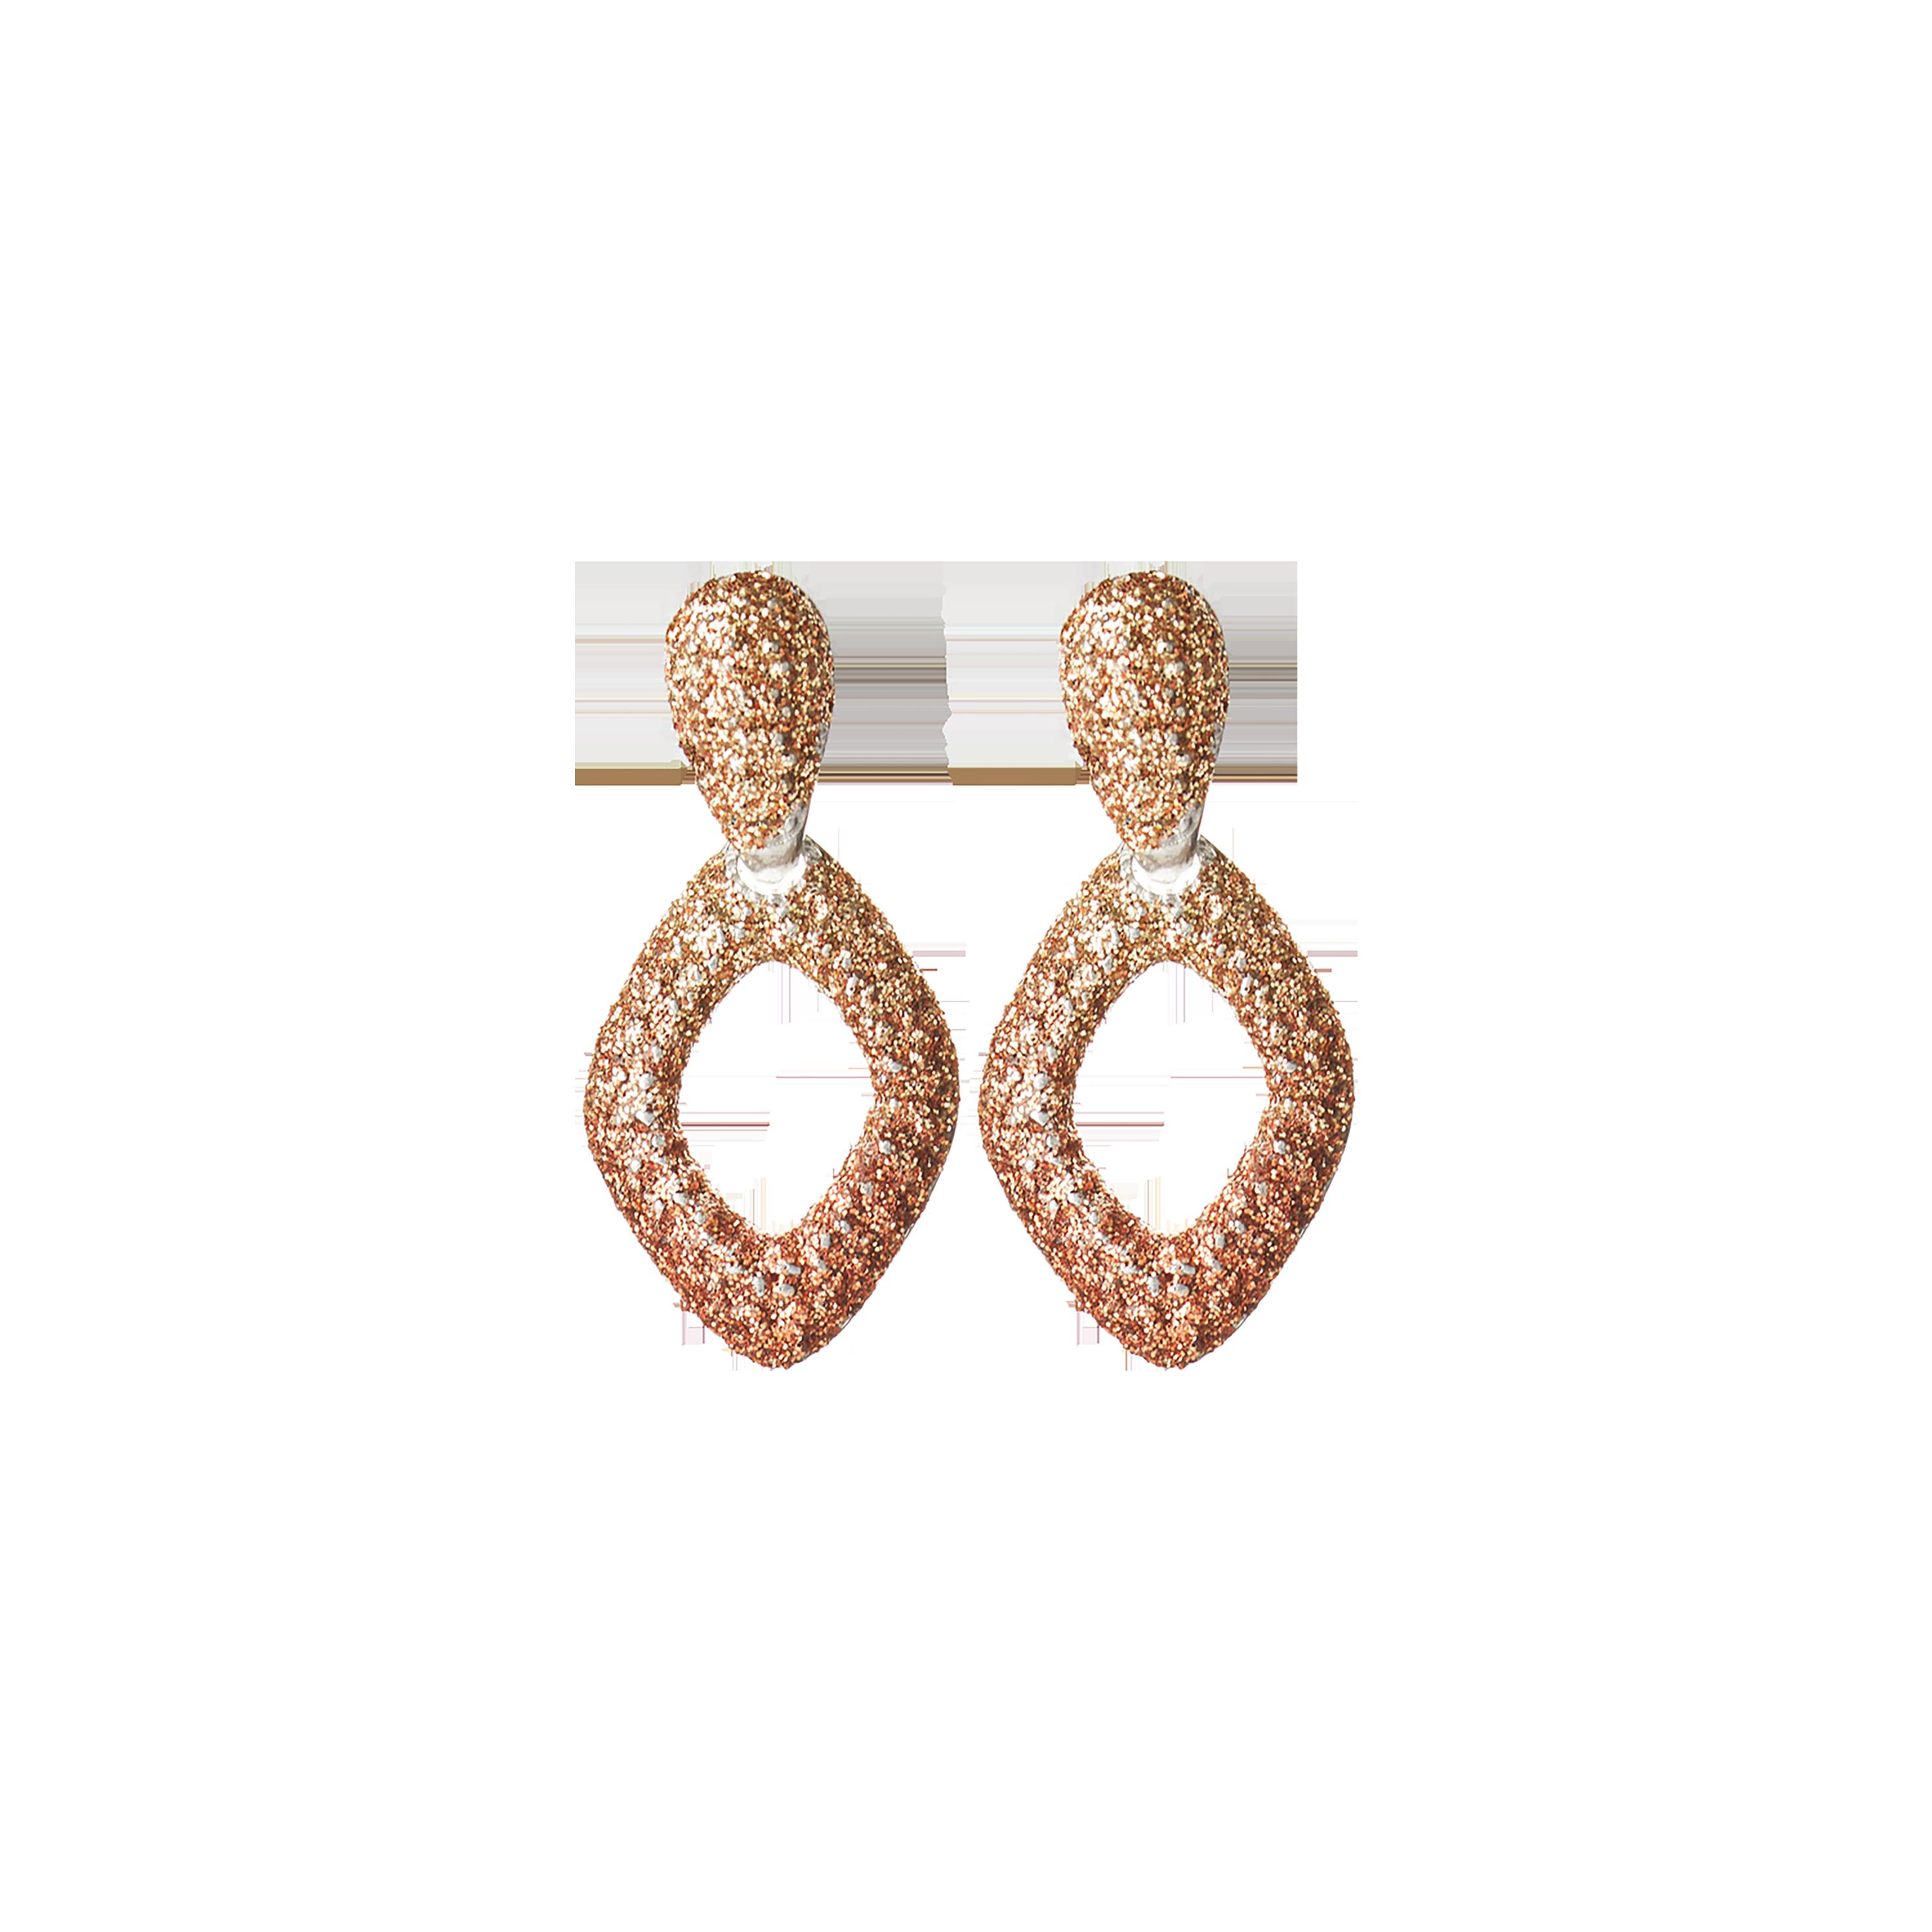 KMO Paris - Earrings 802026